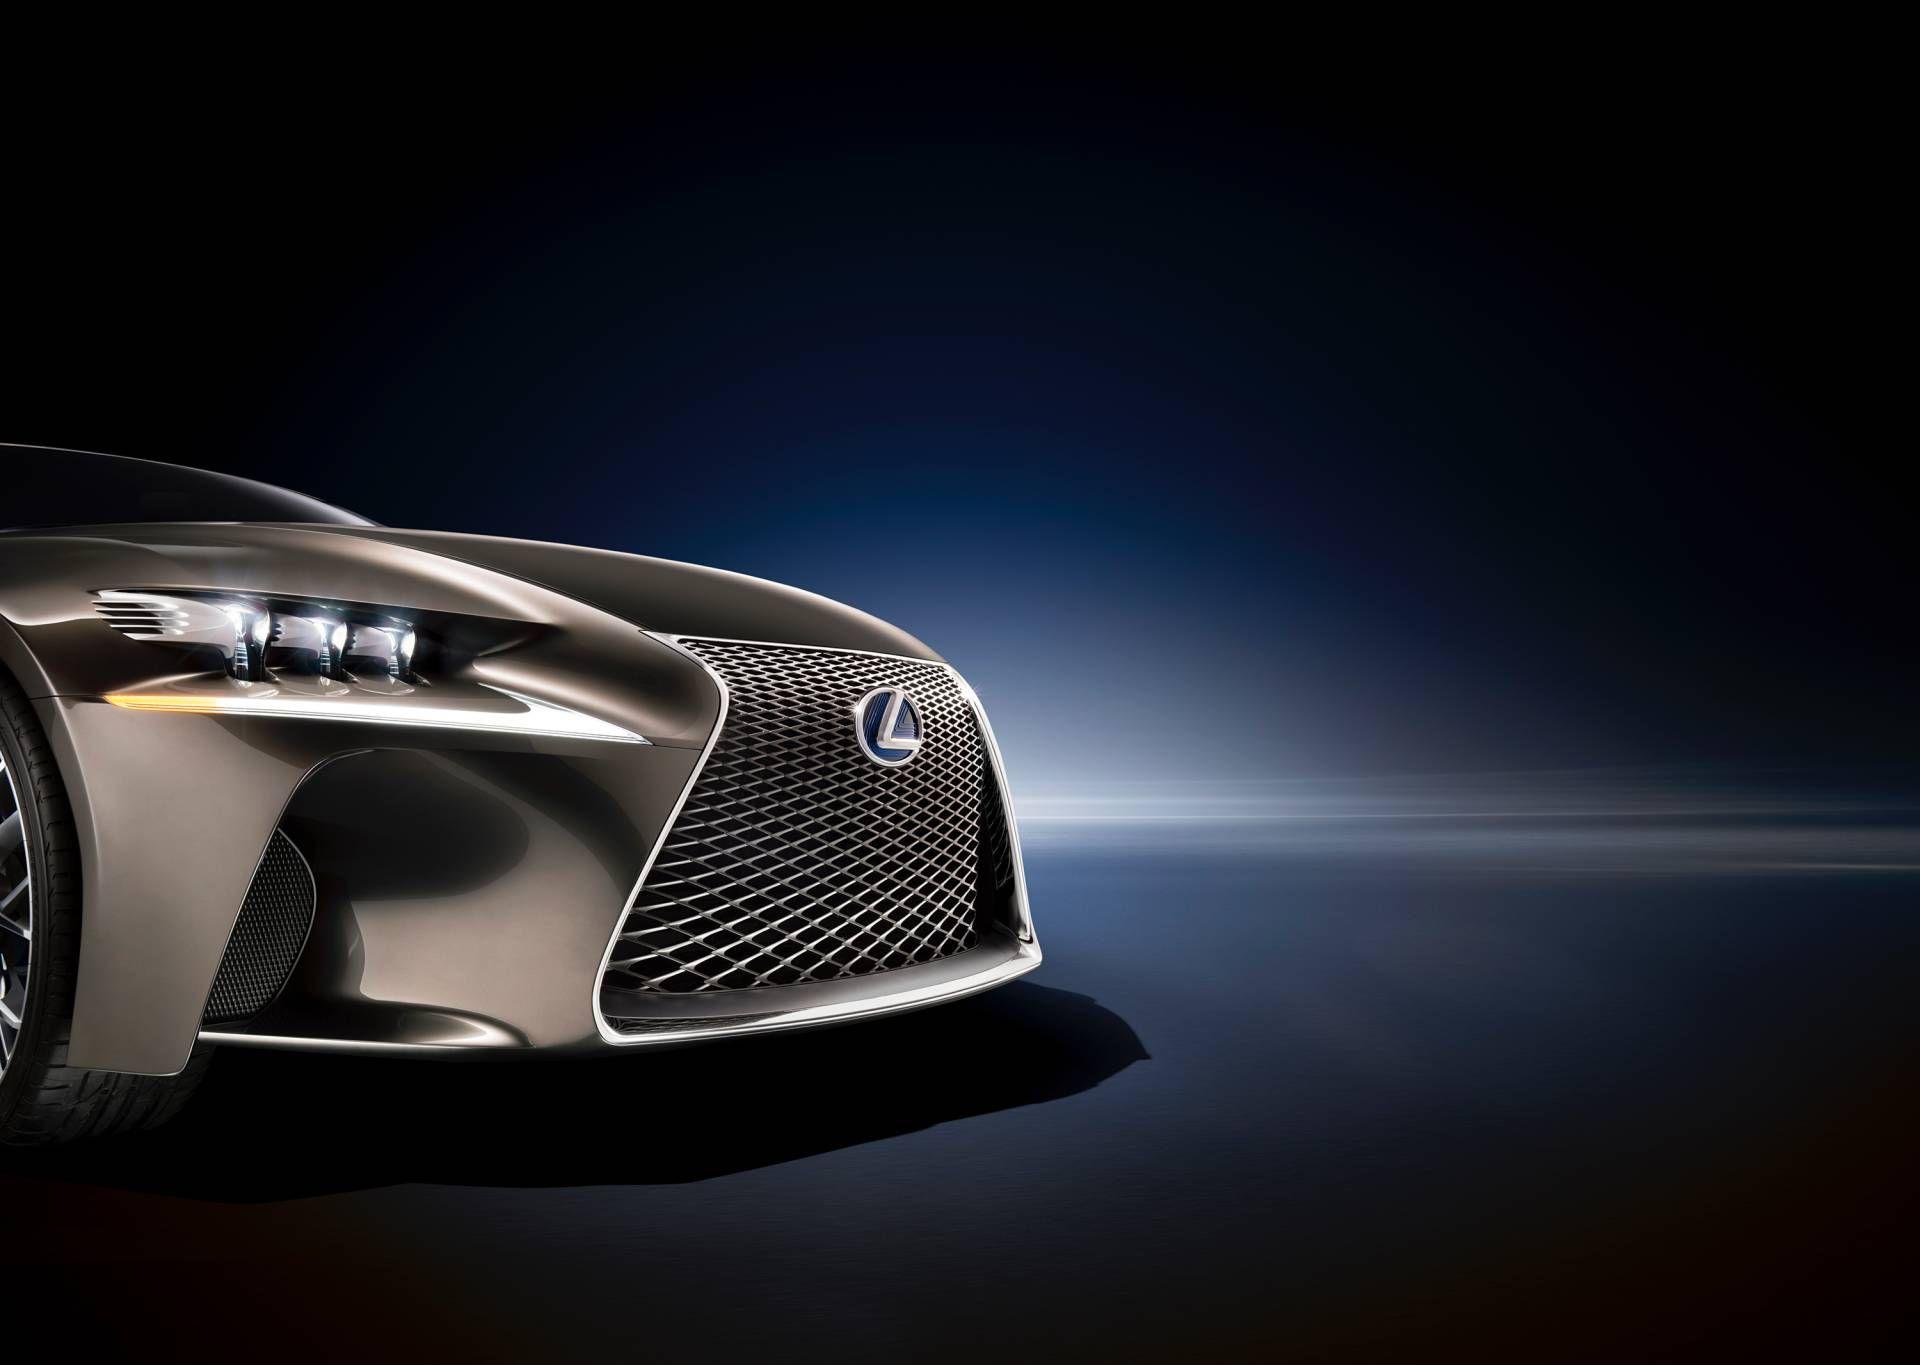 2013 Lexus LFCC Concept Images New lexus